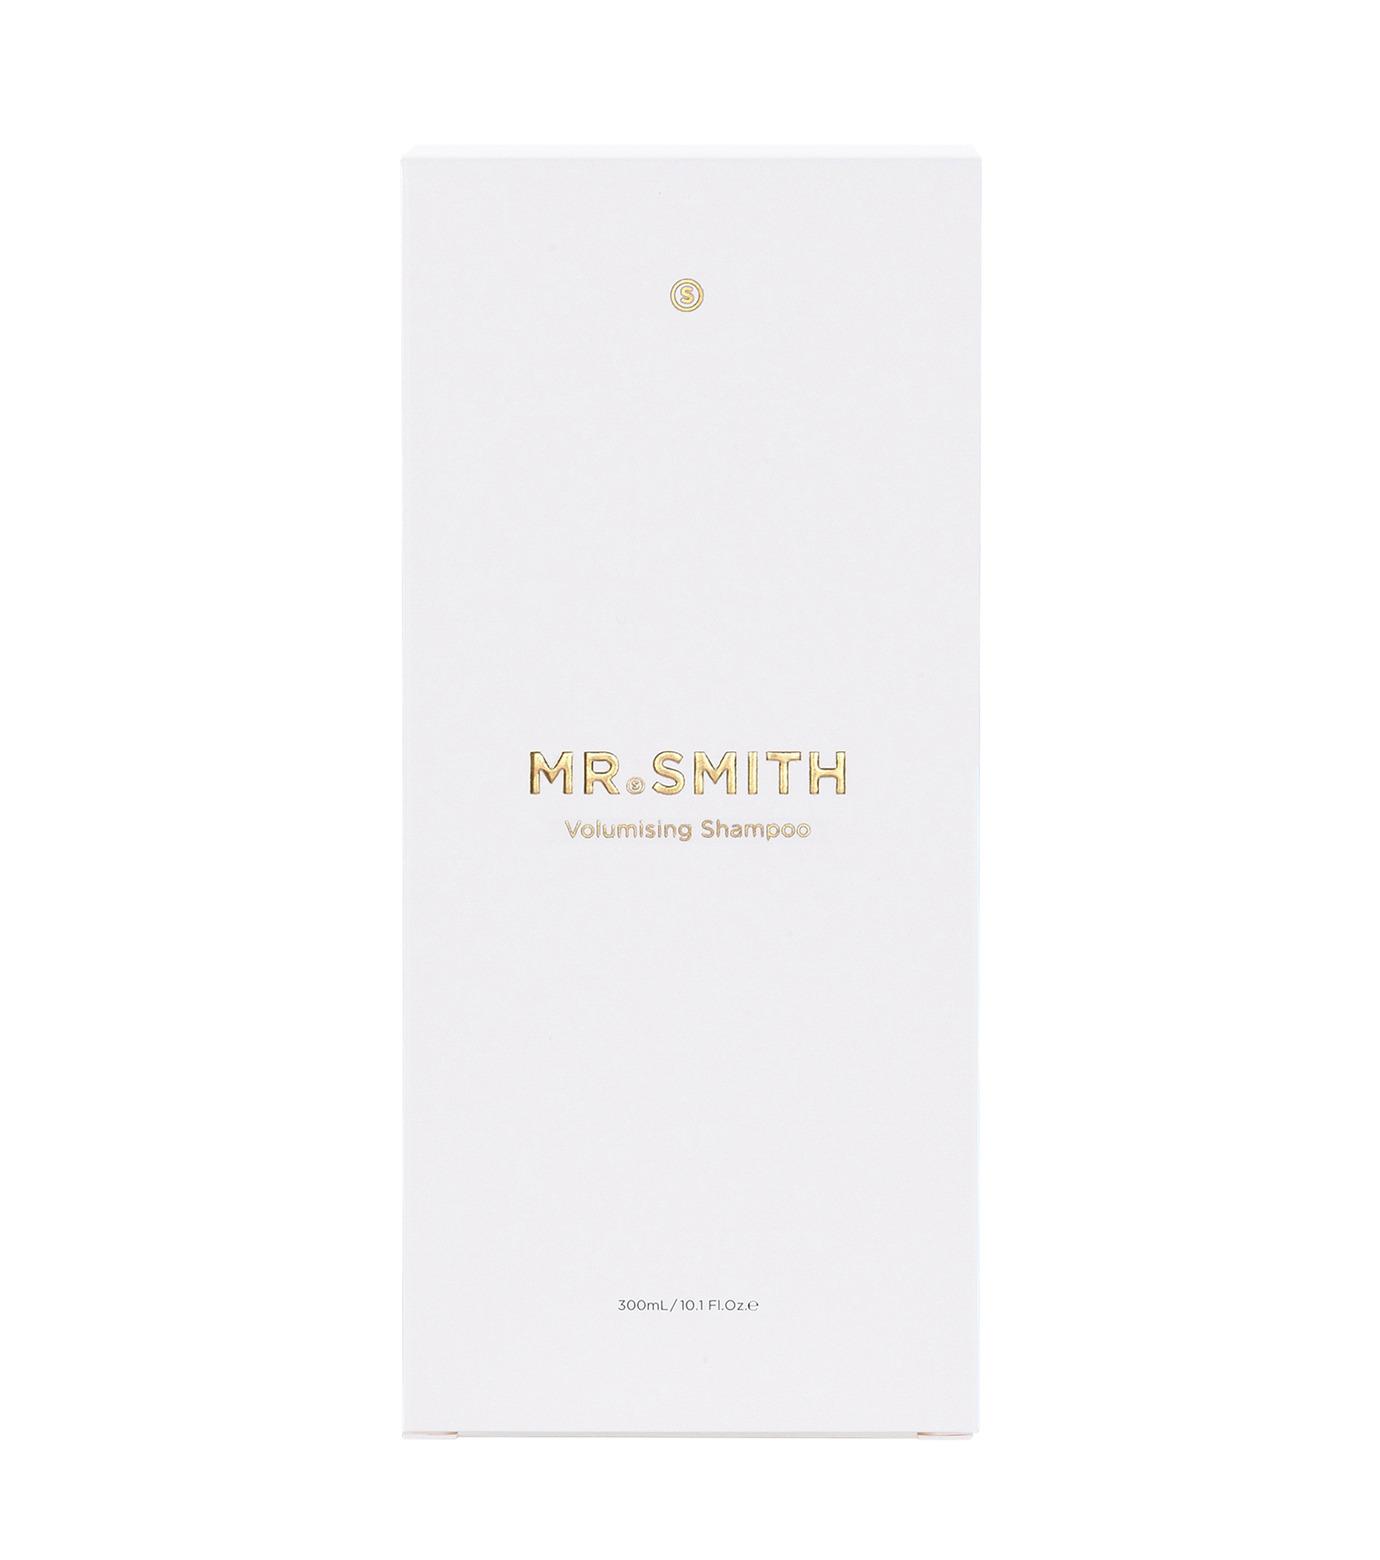 MR.SMITH()のVolumising Shampoo-WHITE(HAIR-CARE-GROOMING/HAIR-CARE-GROOMING)-MR-S105-VM 拡大詳細画像2